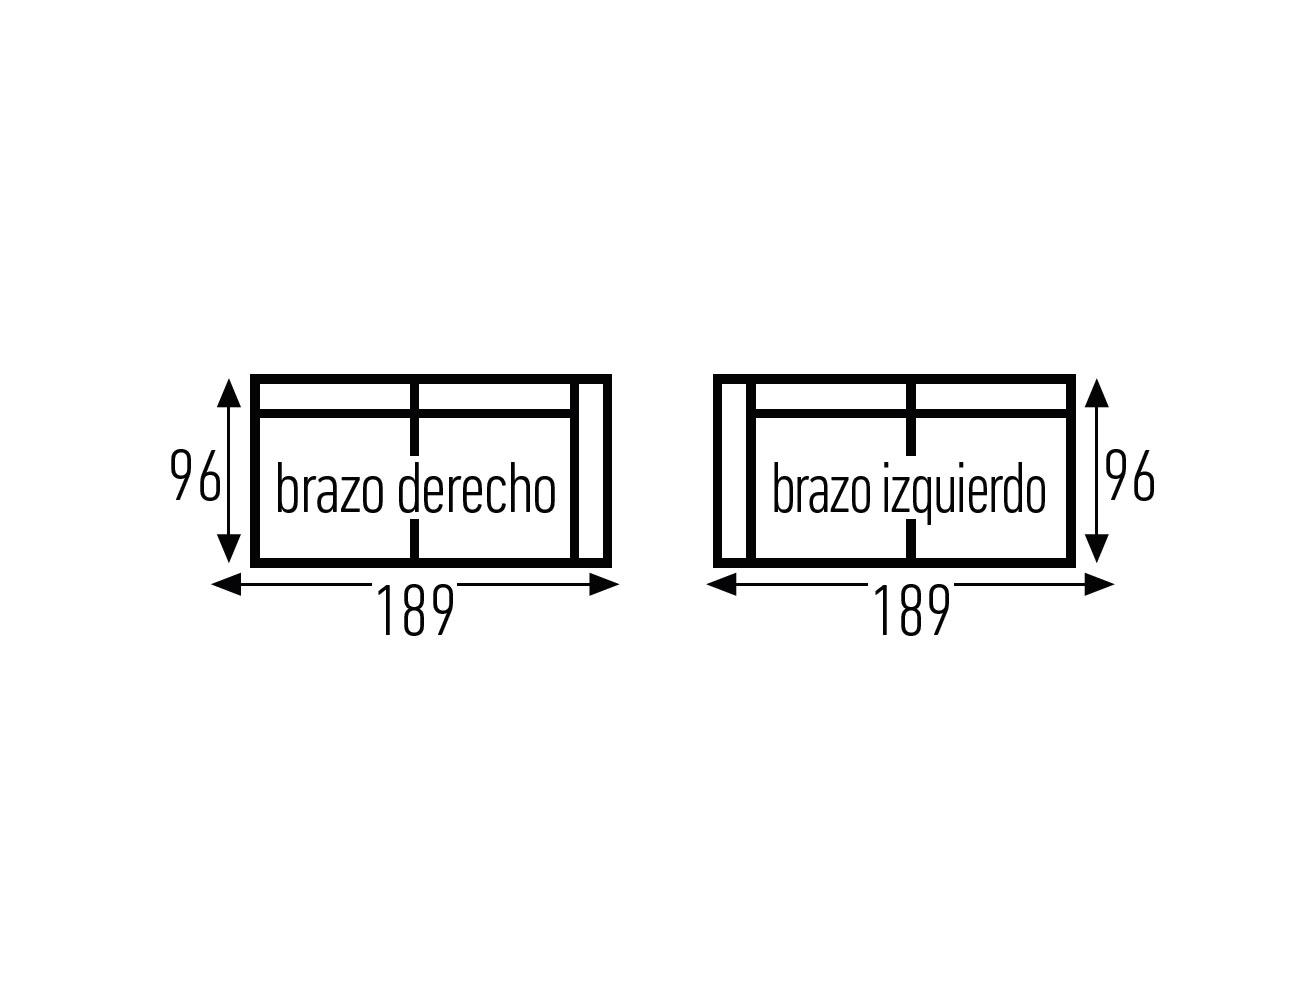 Croquis 3p sin 1 brazo 1894